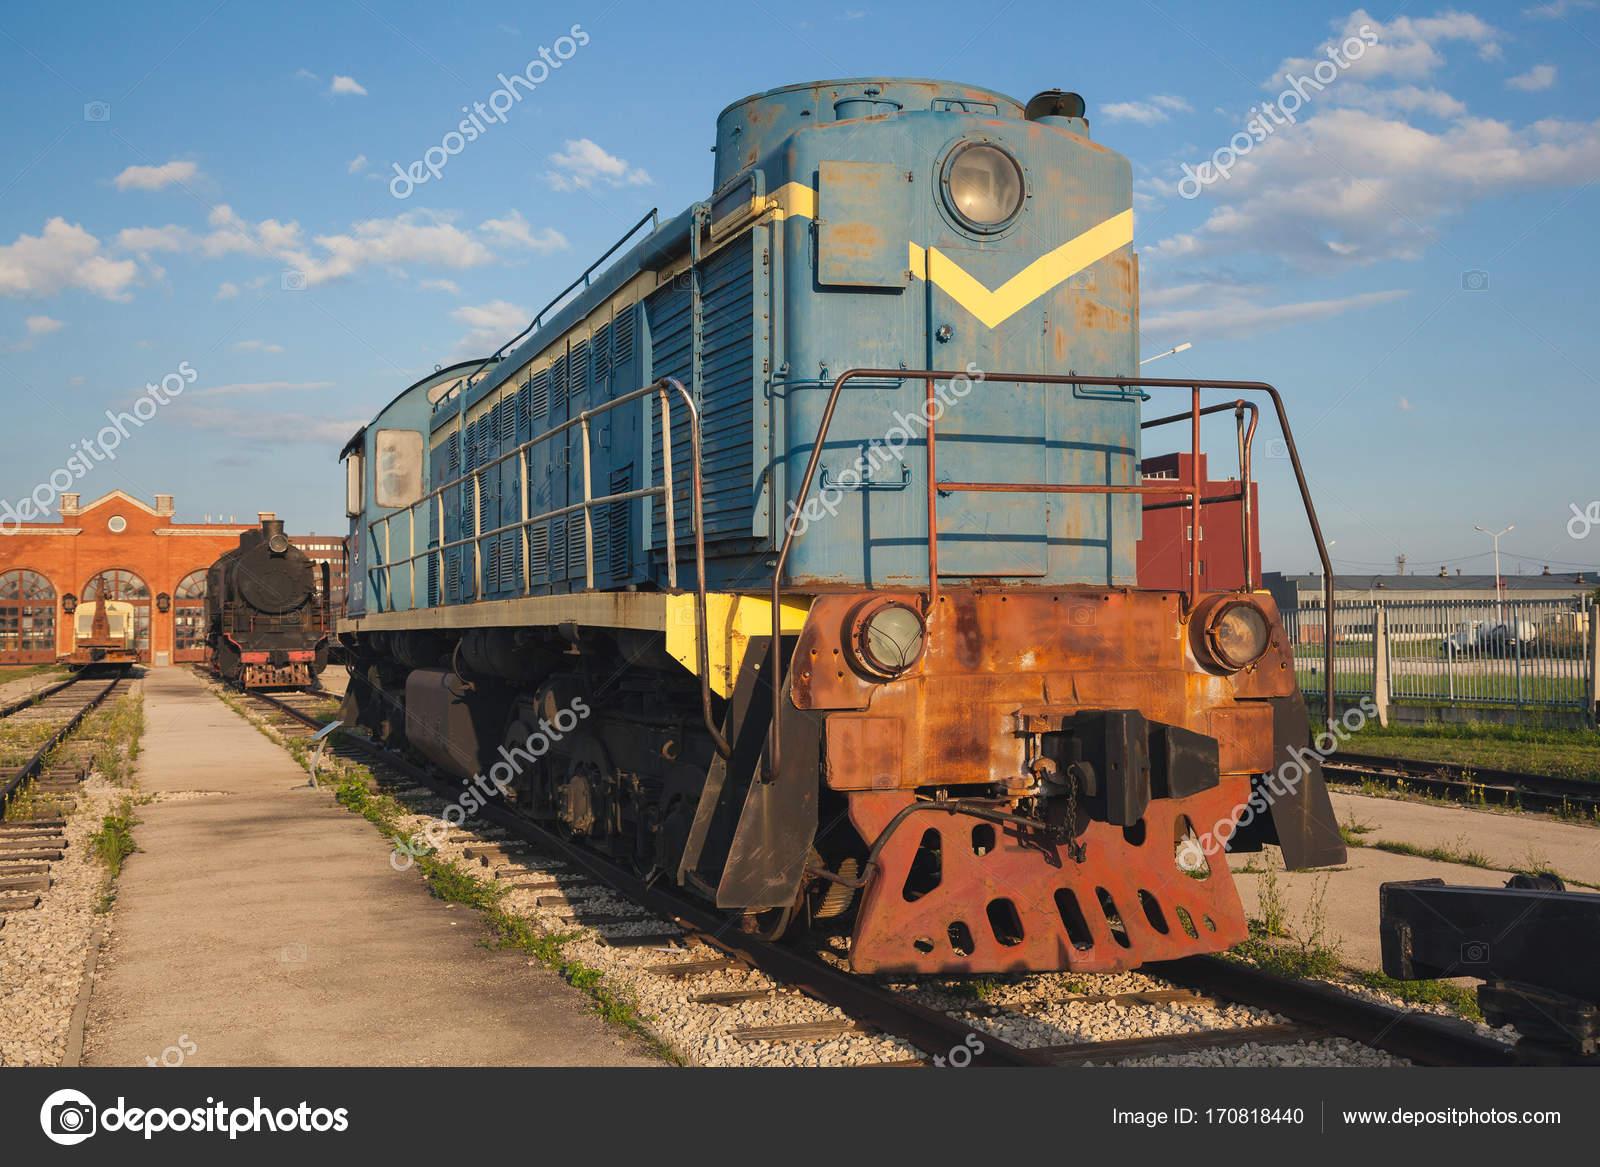 St. Petersburg Demiryolu Hareketi